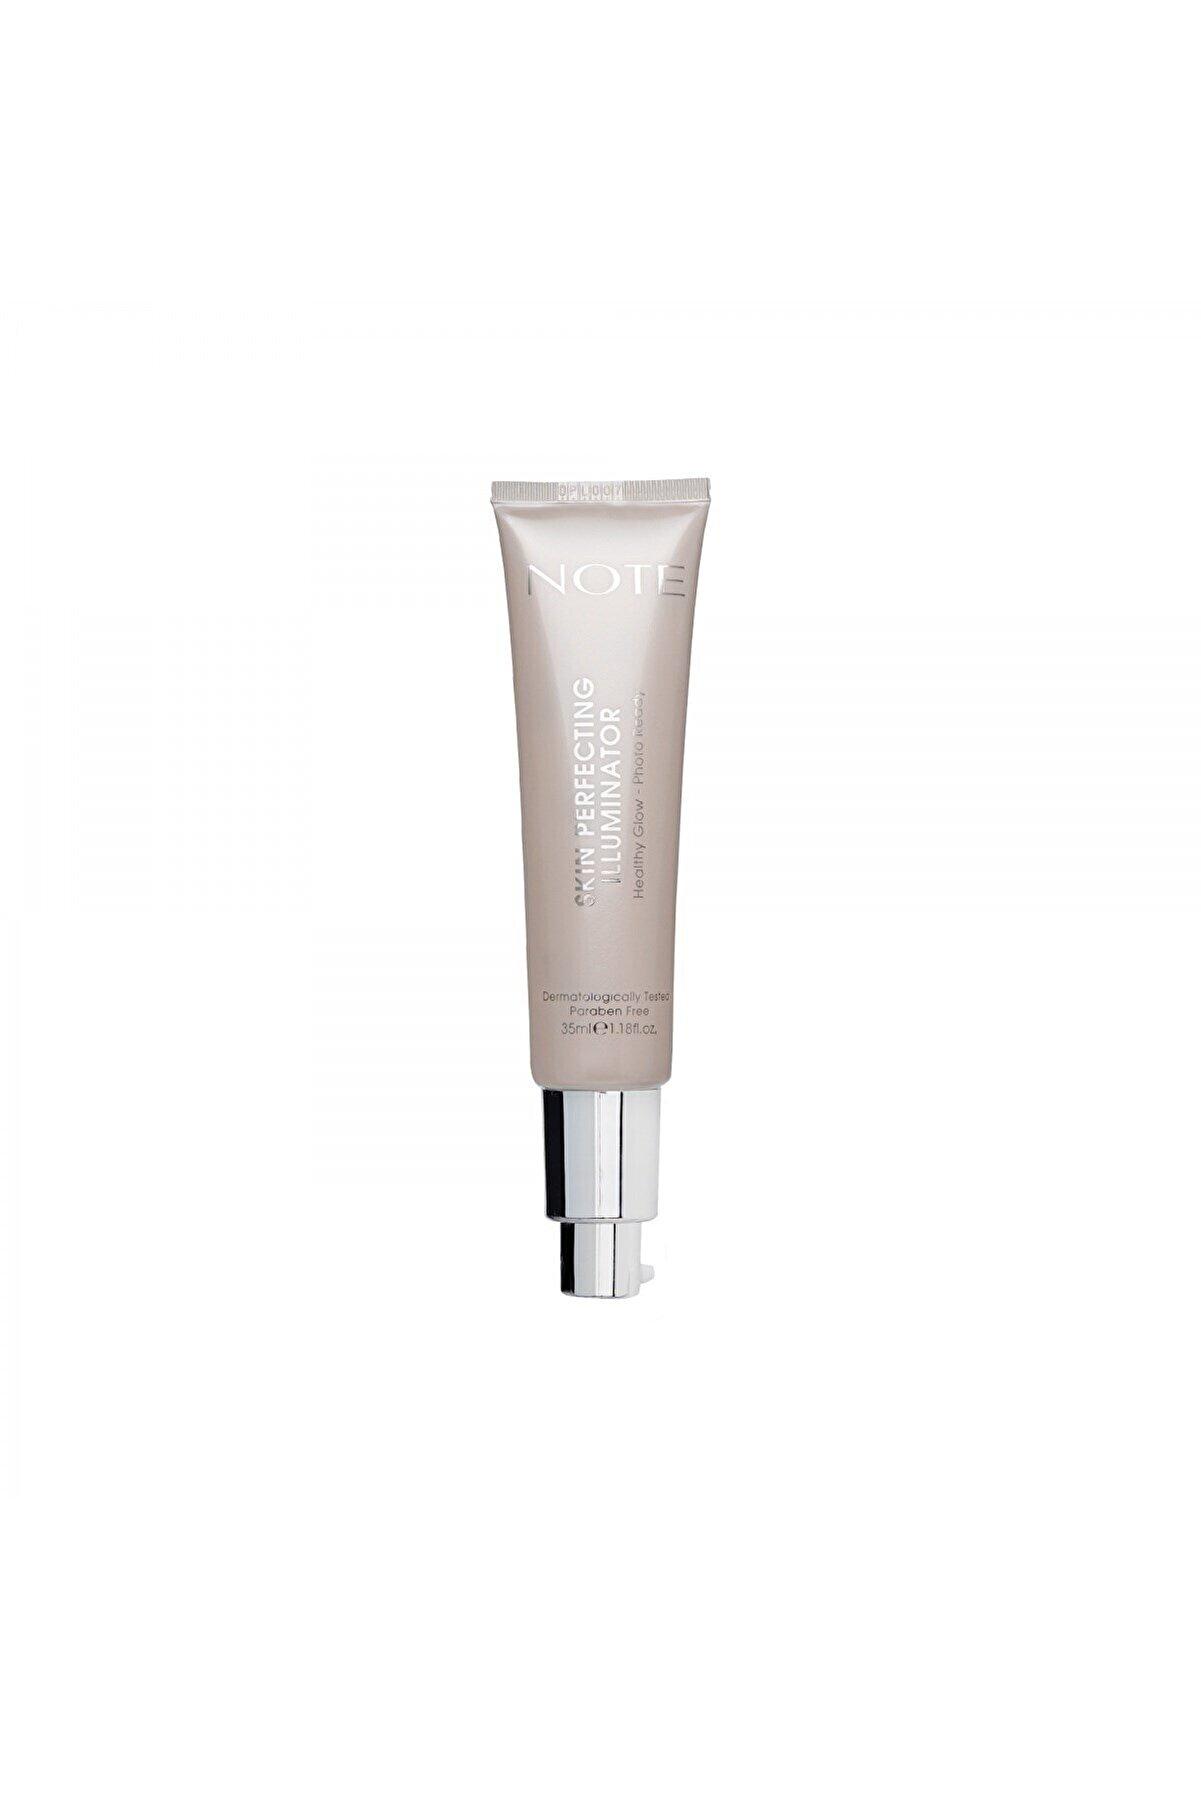 Note Cosmetics Skin Perfecting Illuminator Aydınlatıcı Makyaj Bazı